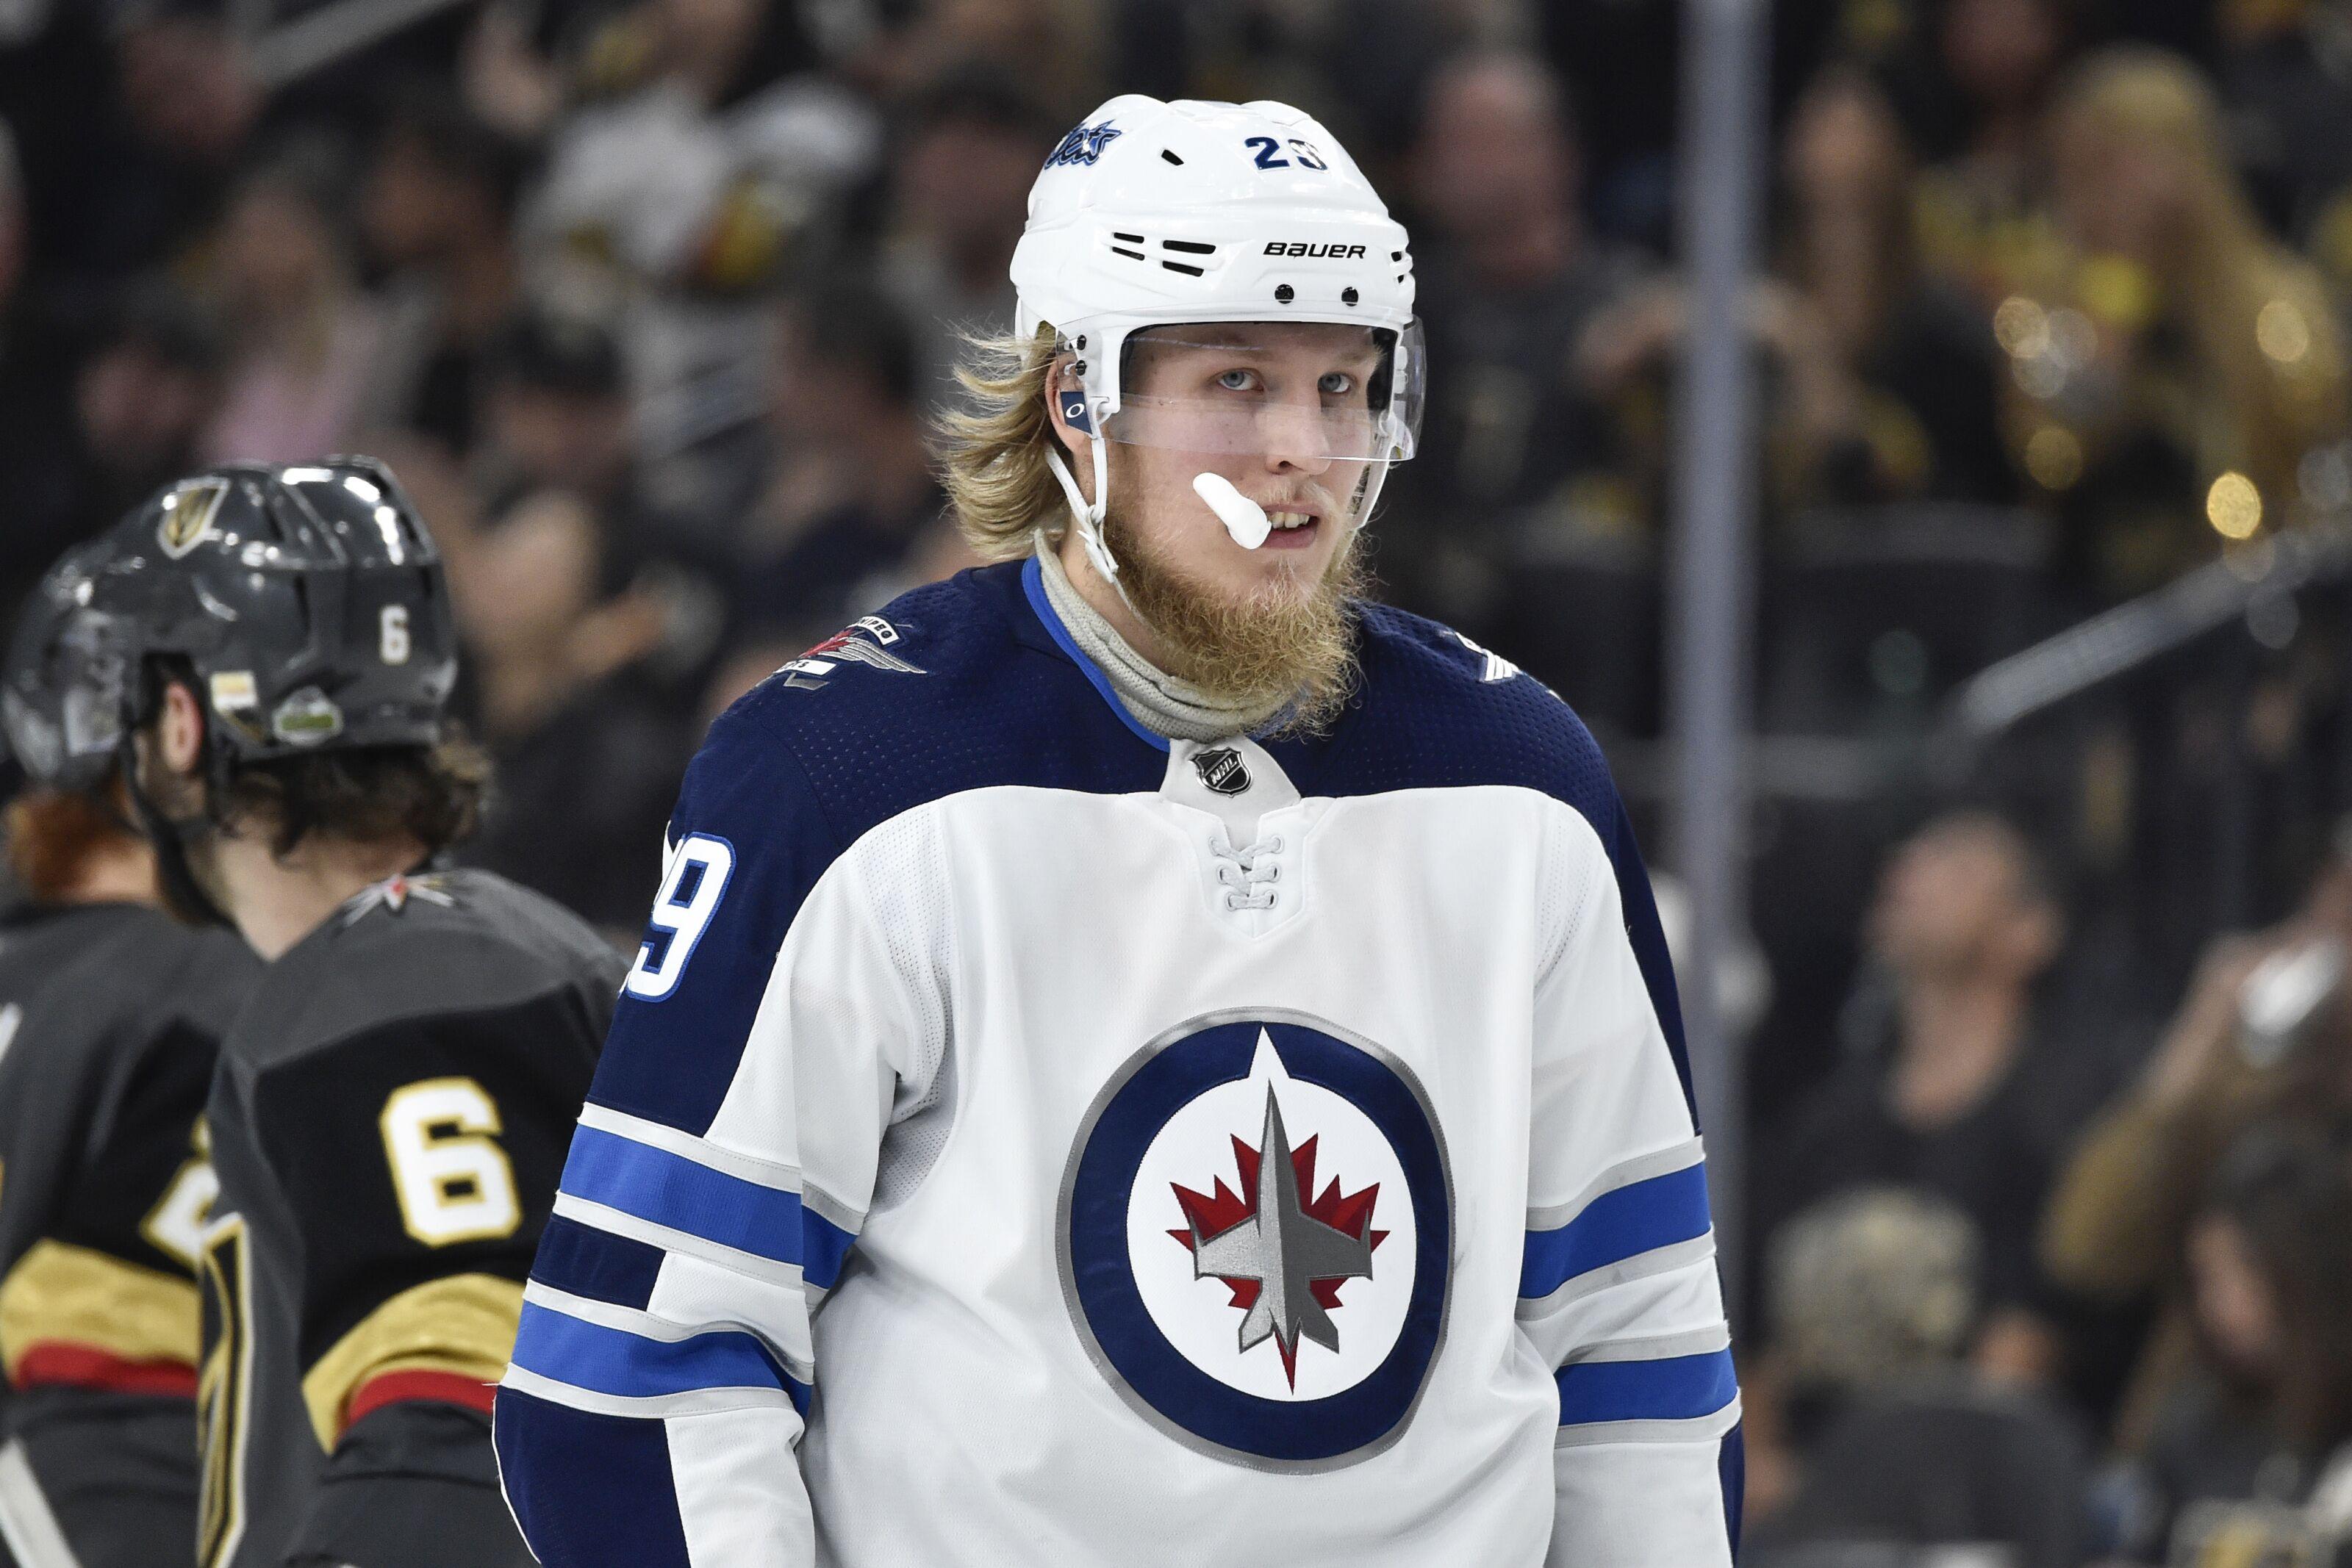 Winnipeg Jets: Patrik Laine's Preseason Is Not Cause for Concern